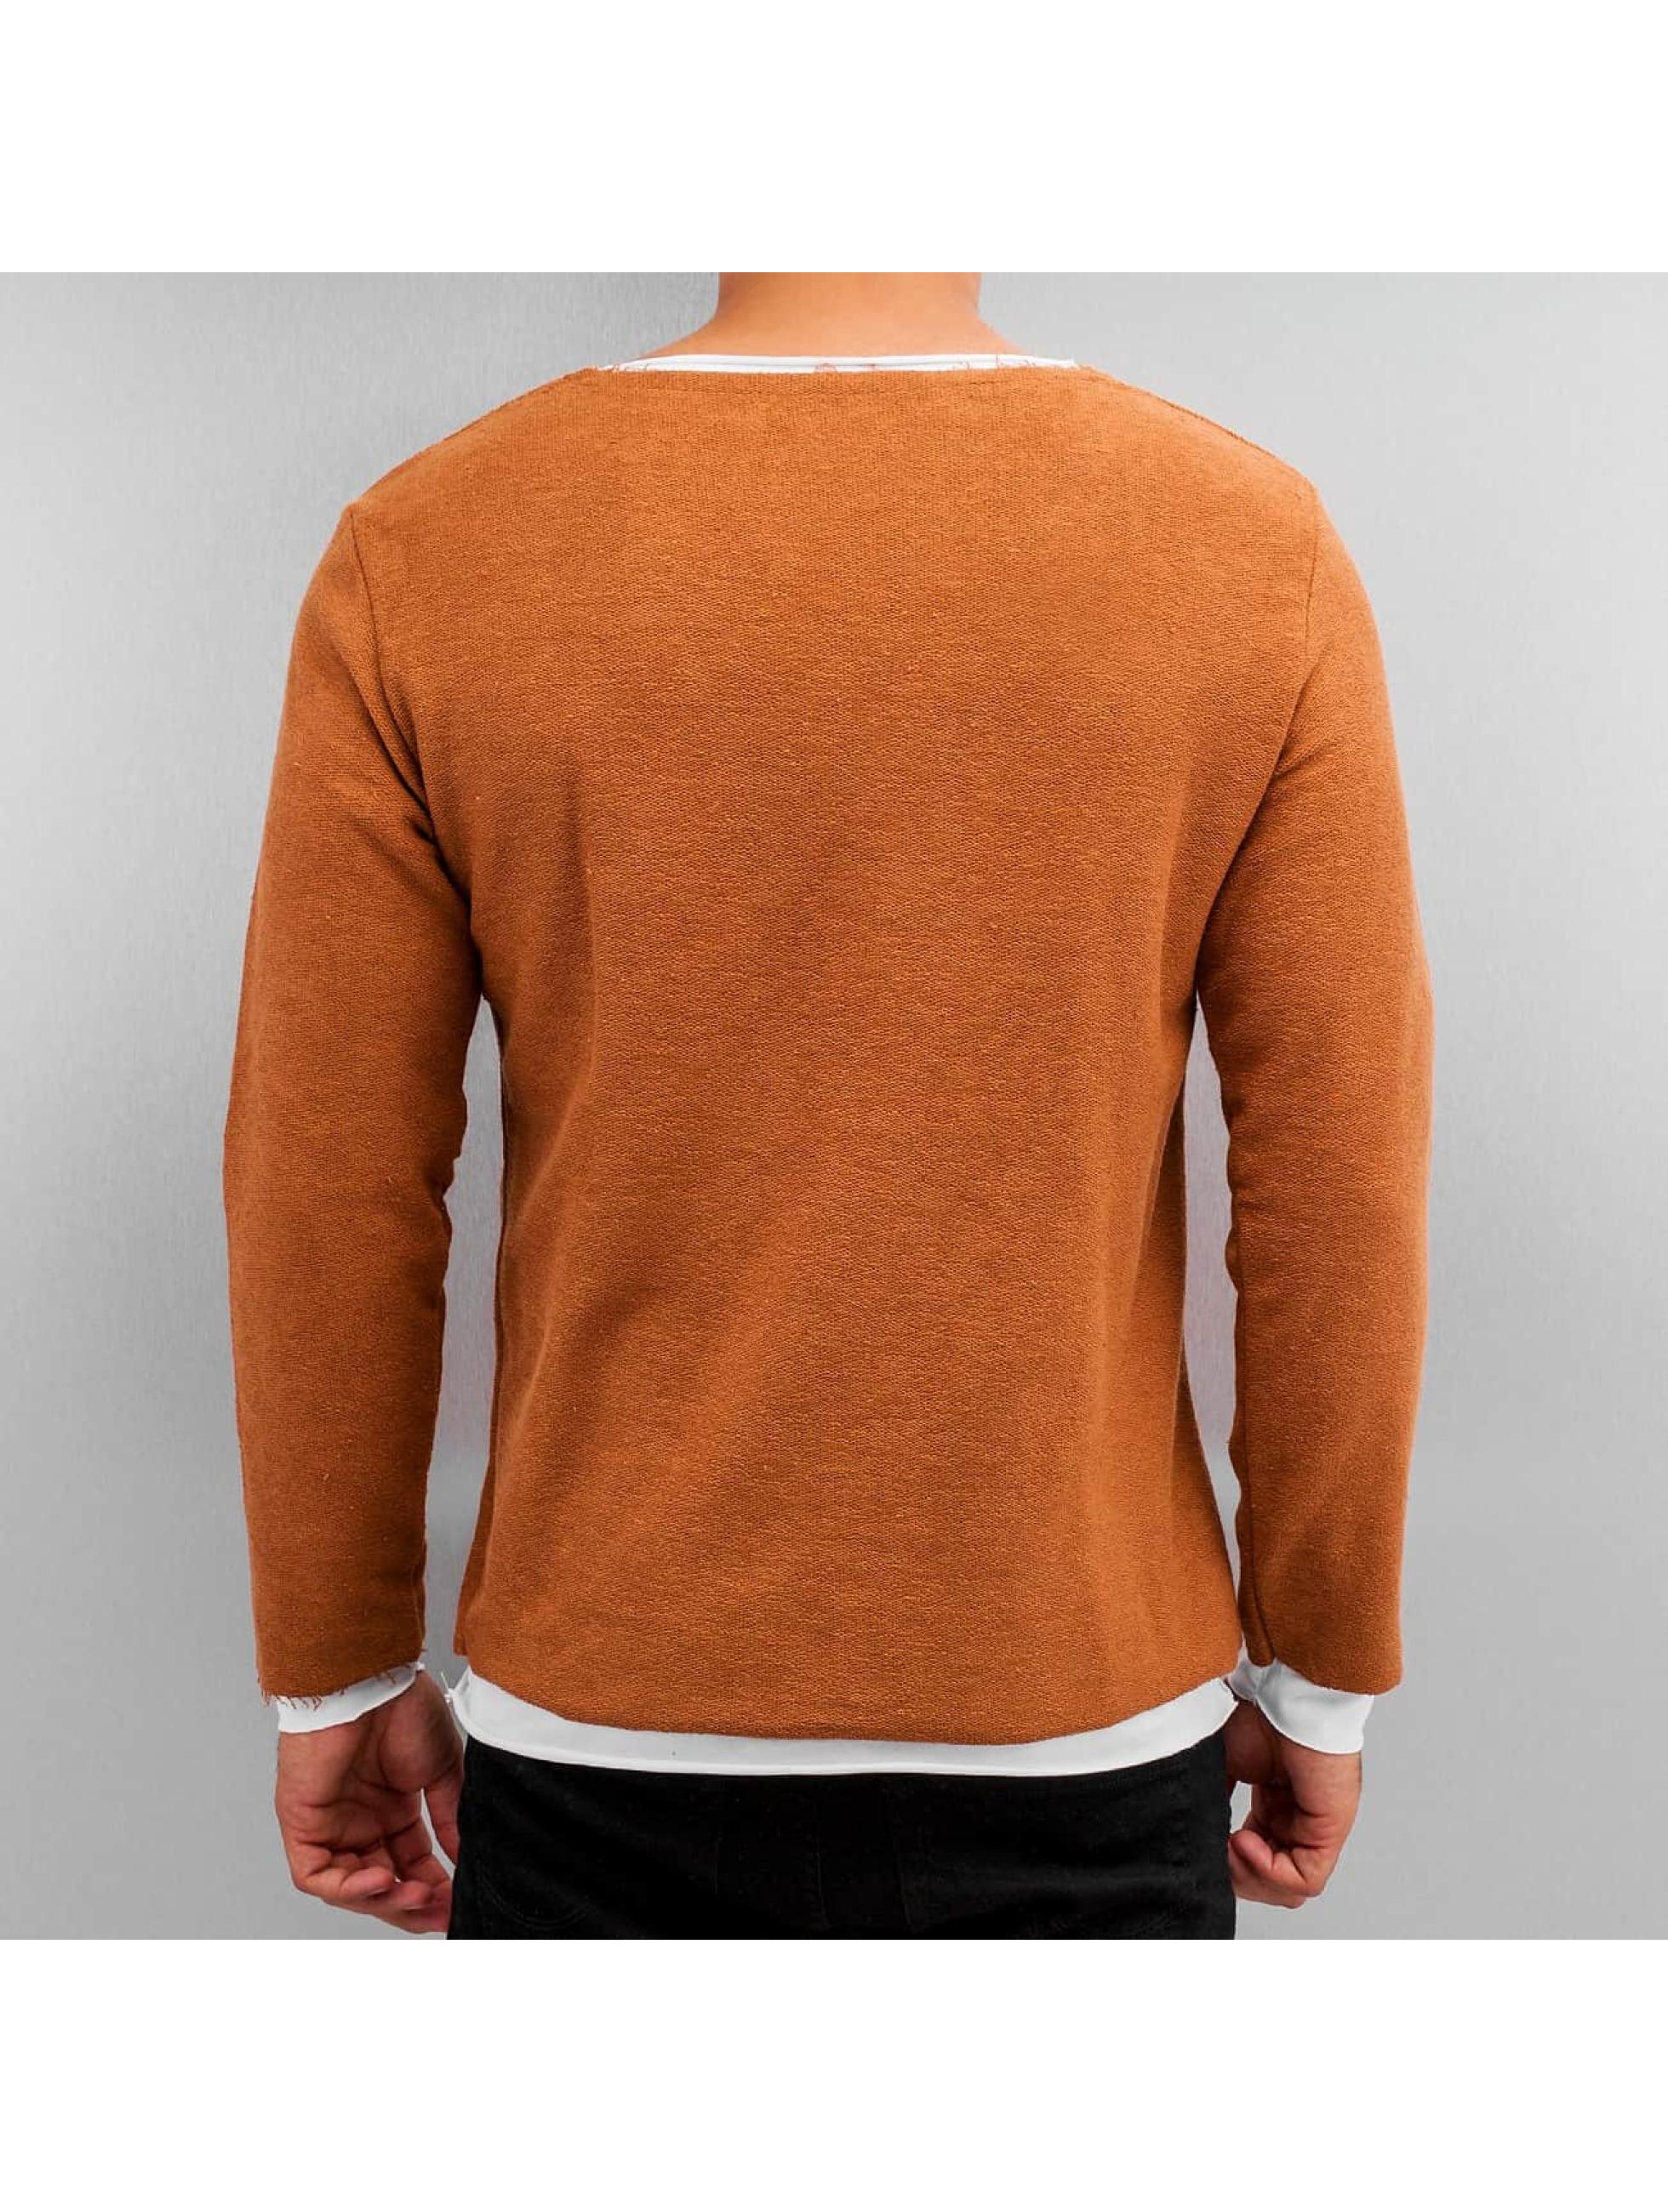 2Y Pitkähihaiset paidat Pett oranssi